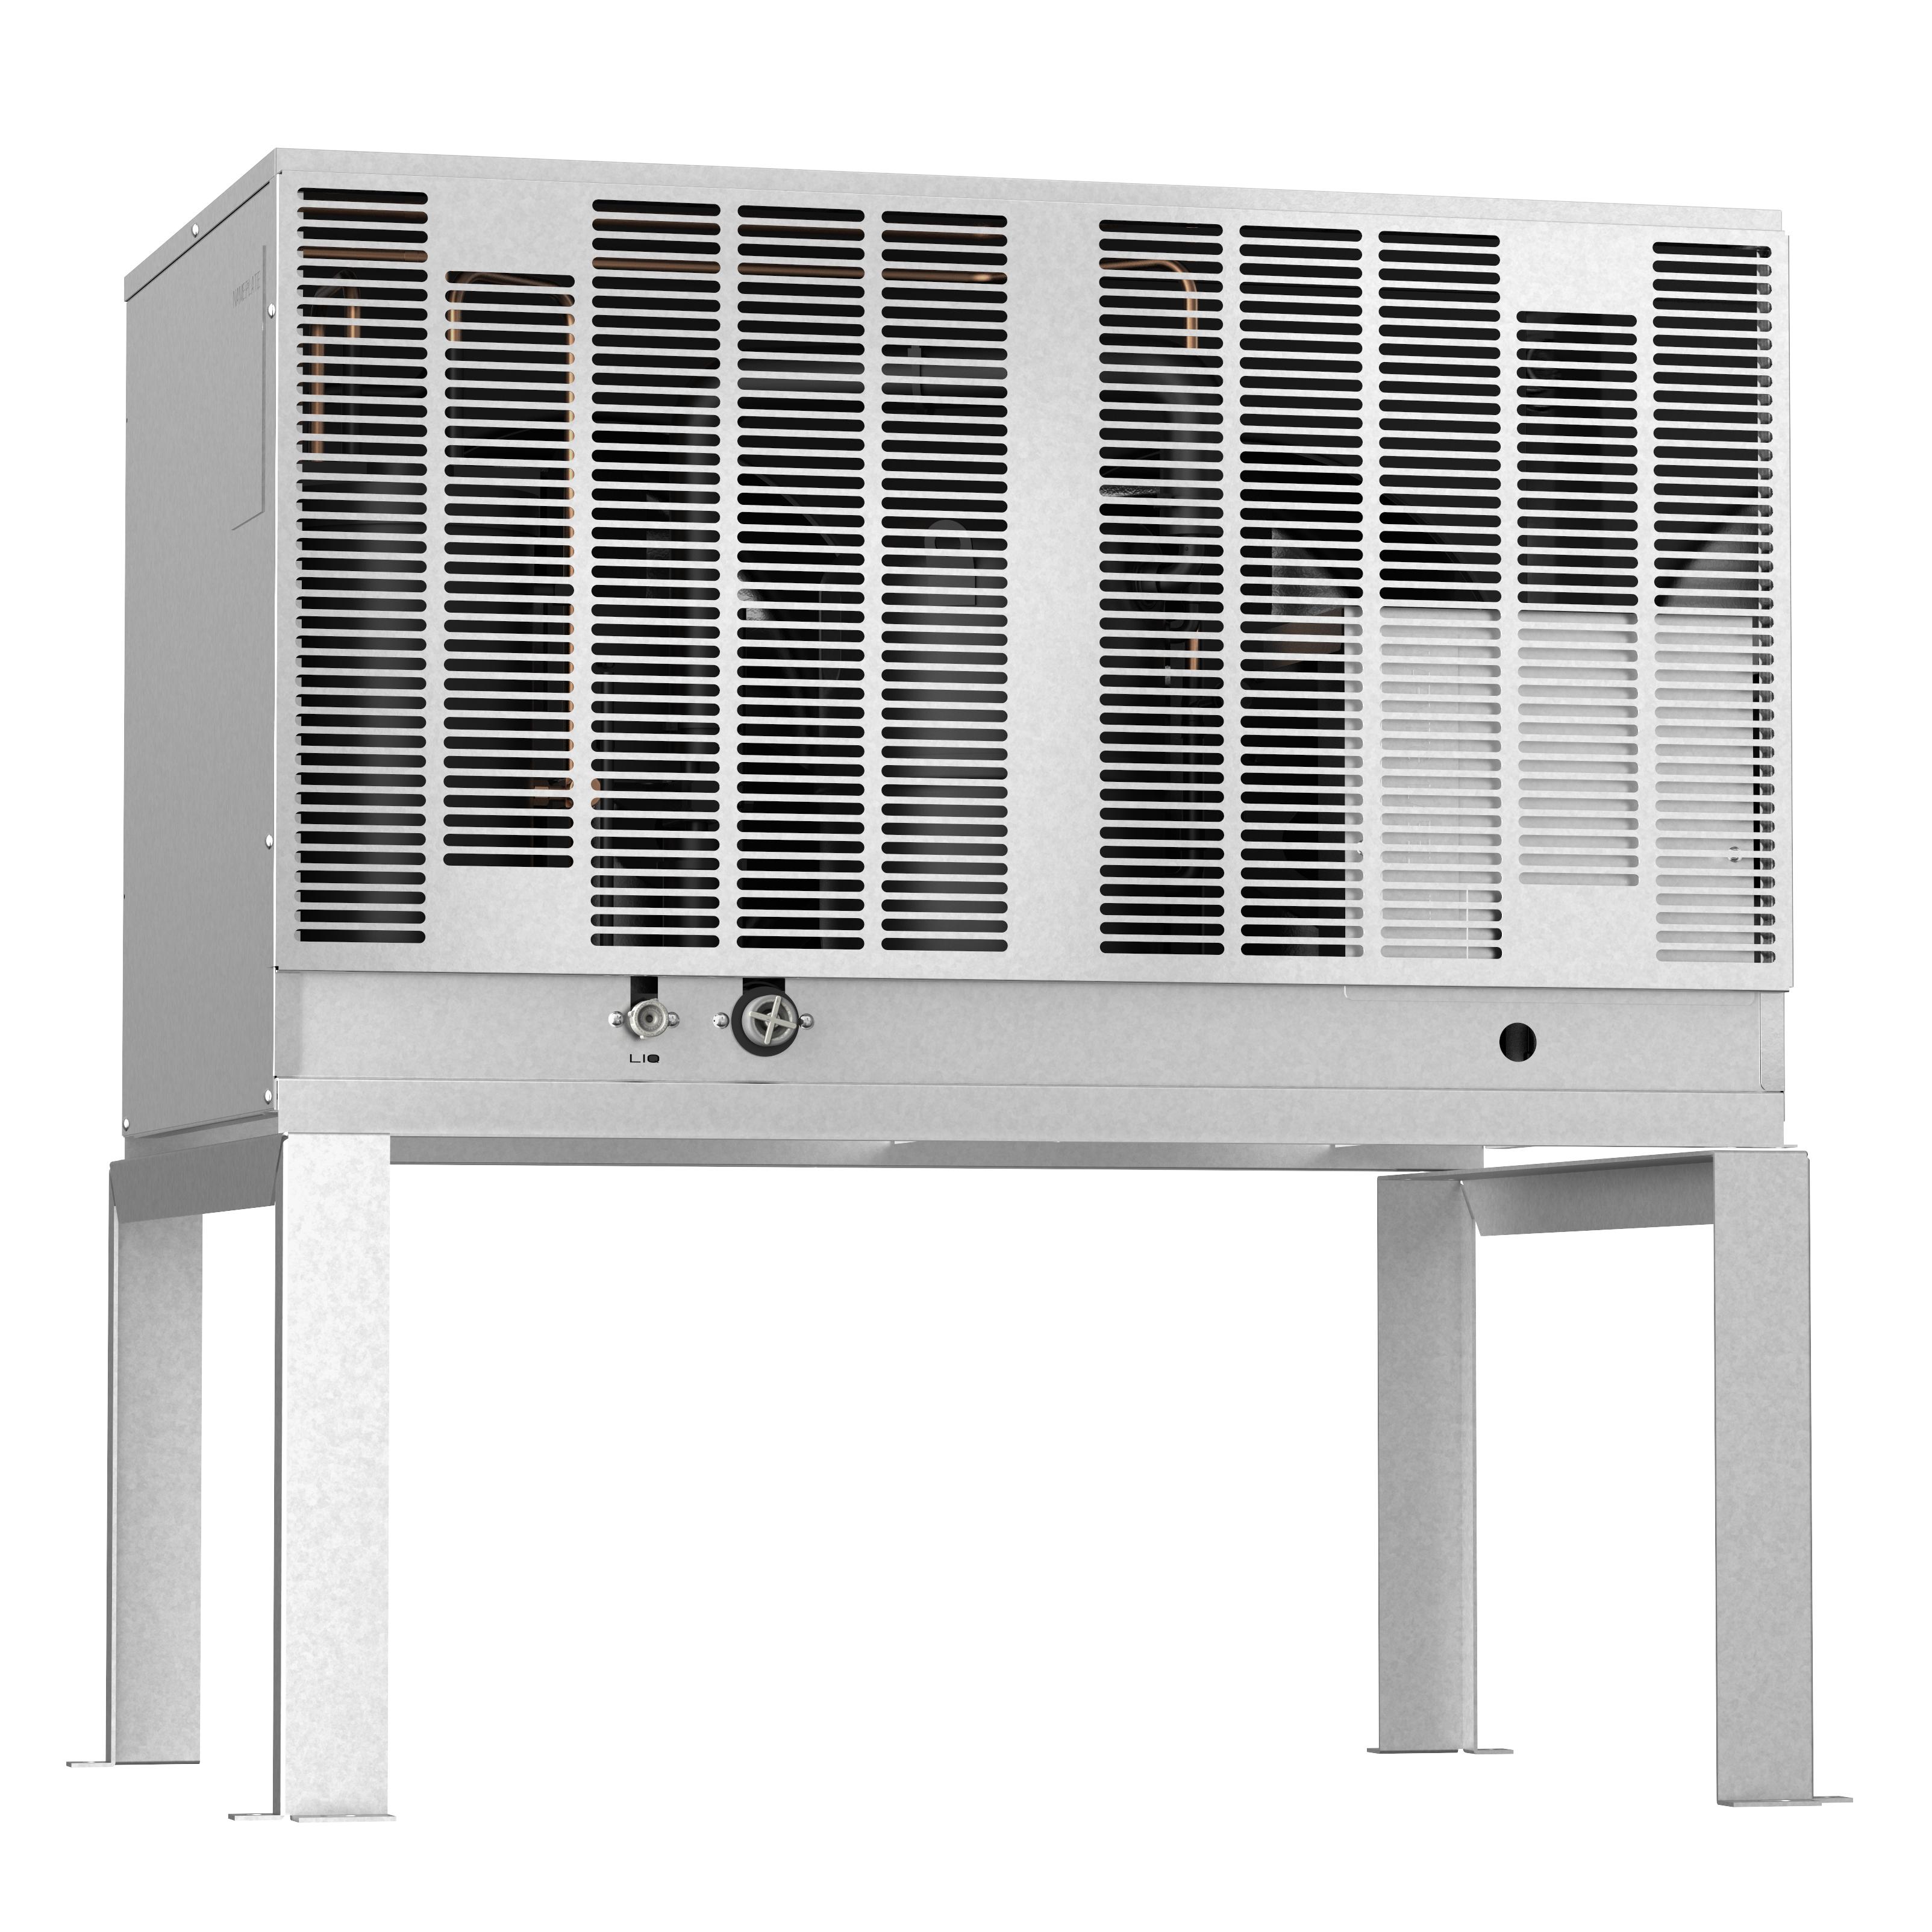 Hoshizaki SRC-14J ice cubers, ice storage & ice dispensers